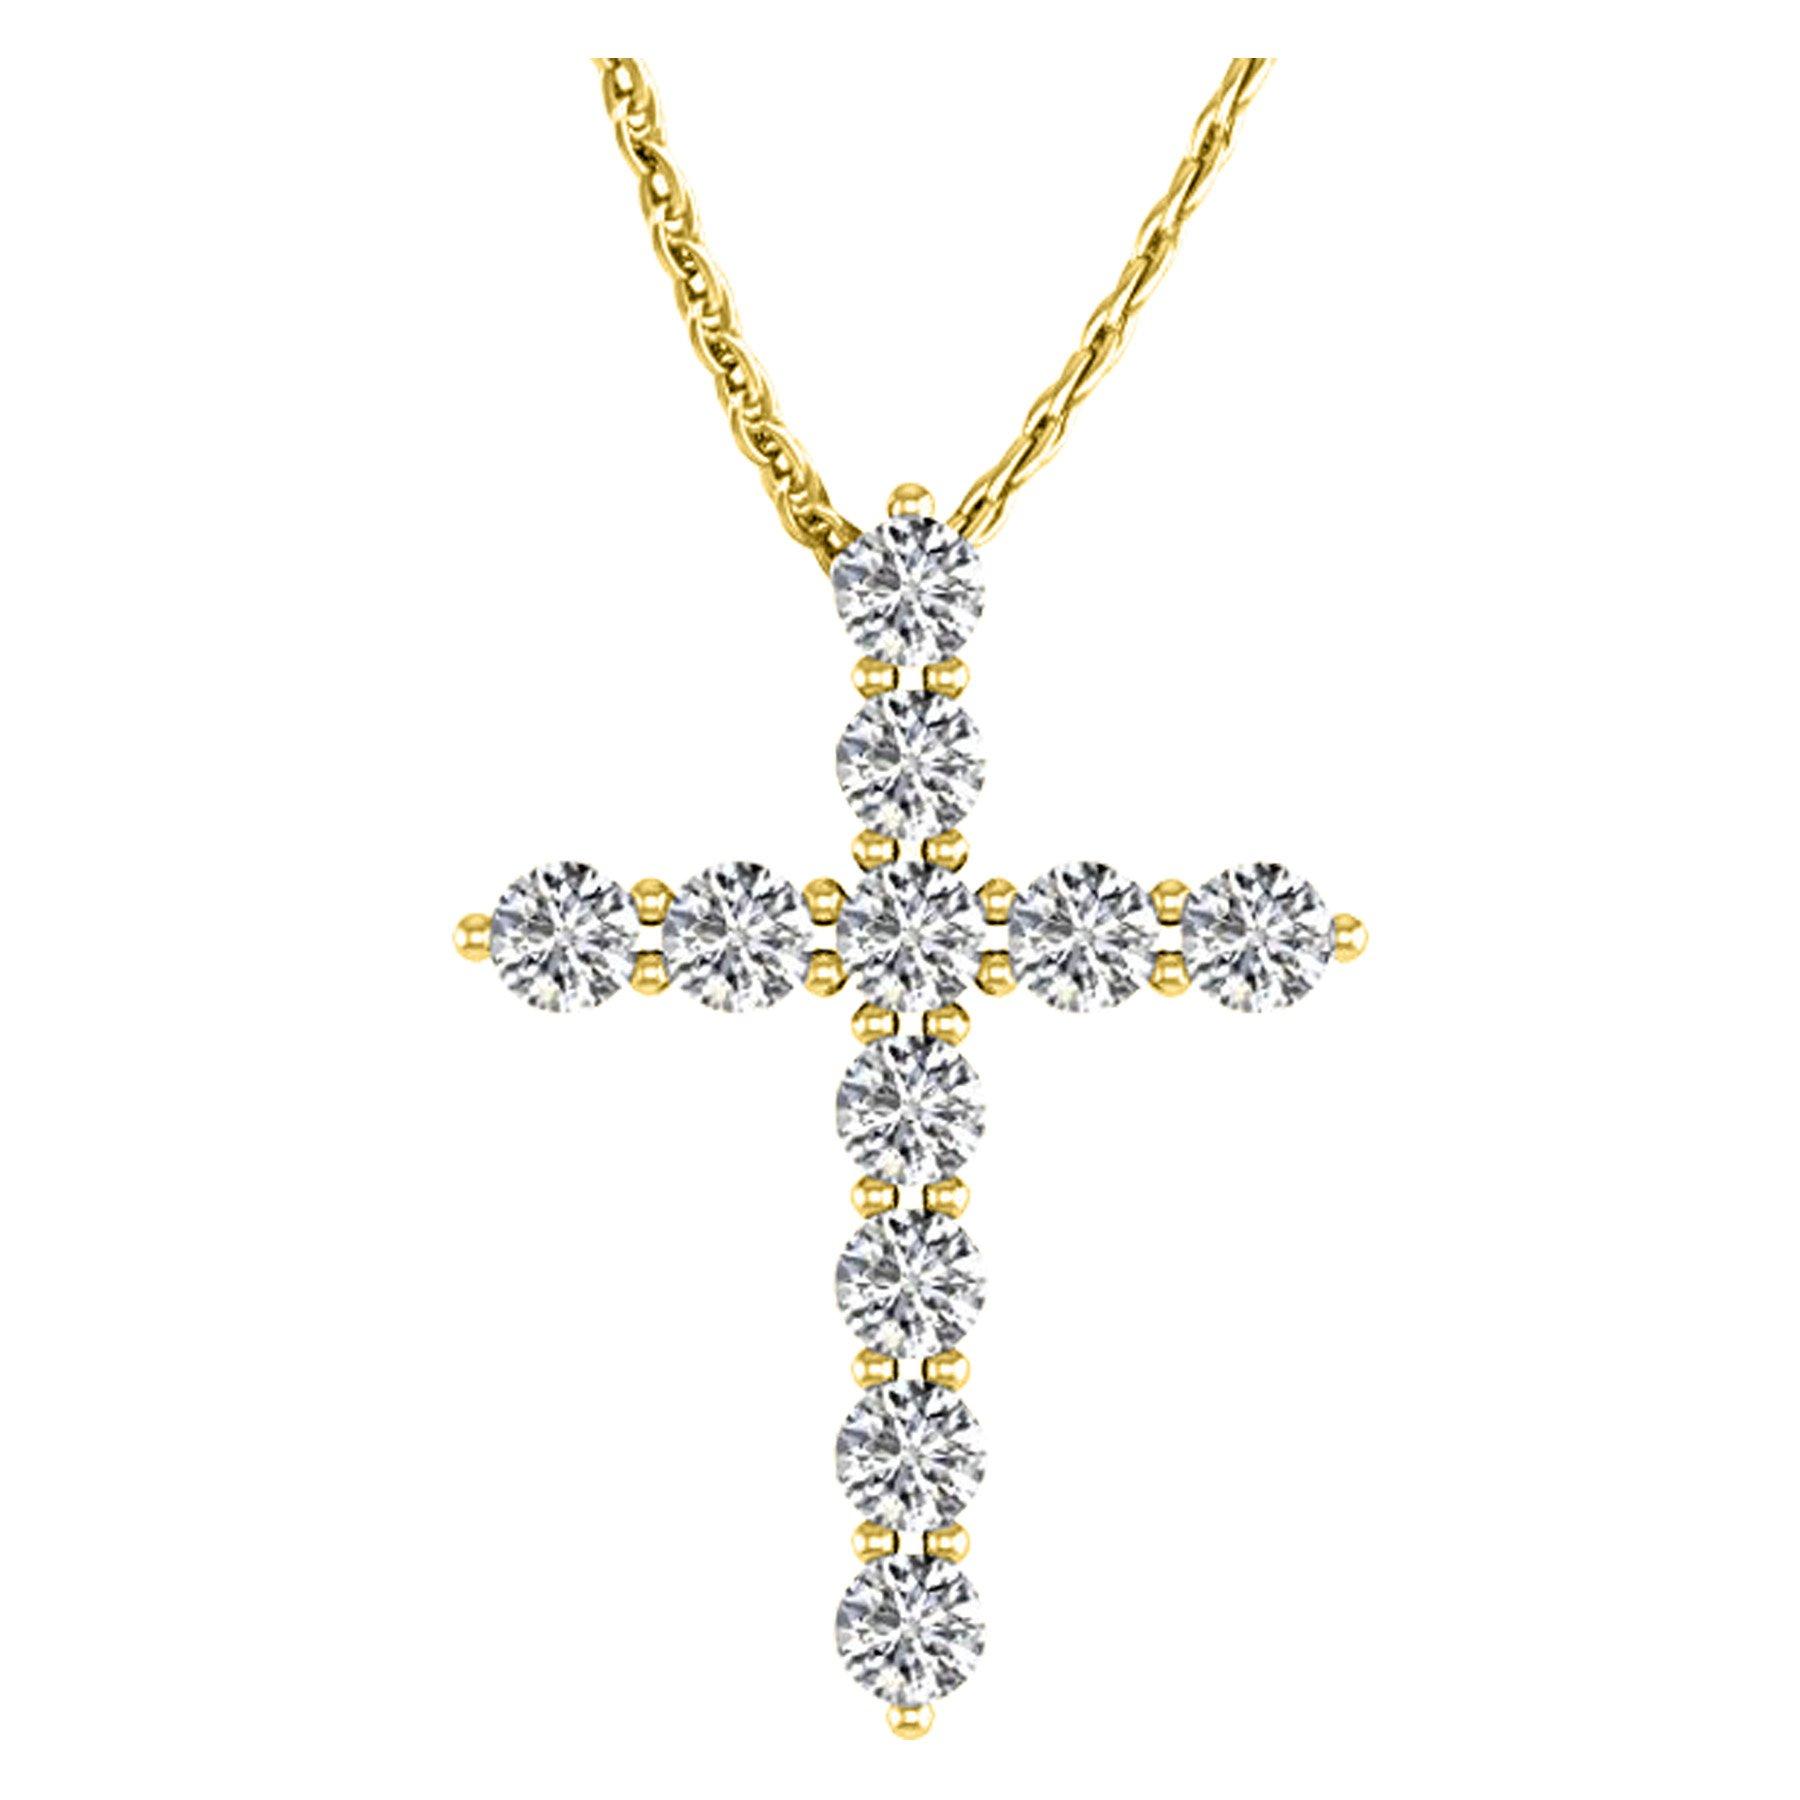 1.5 Carat Total Weight 14K Yellow Gold Diamond Cross Ultra Premium Collection